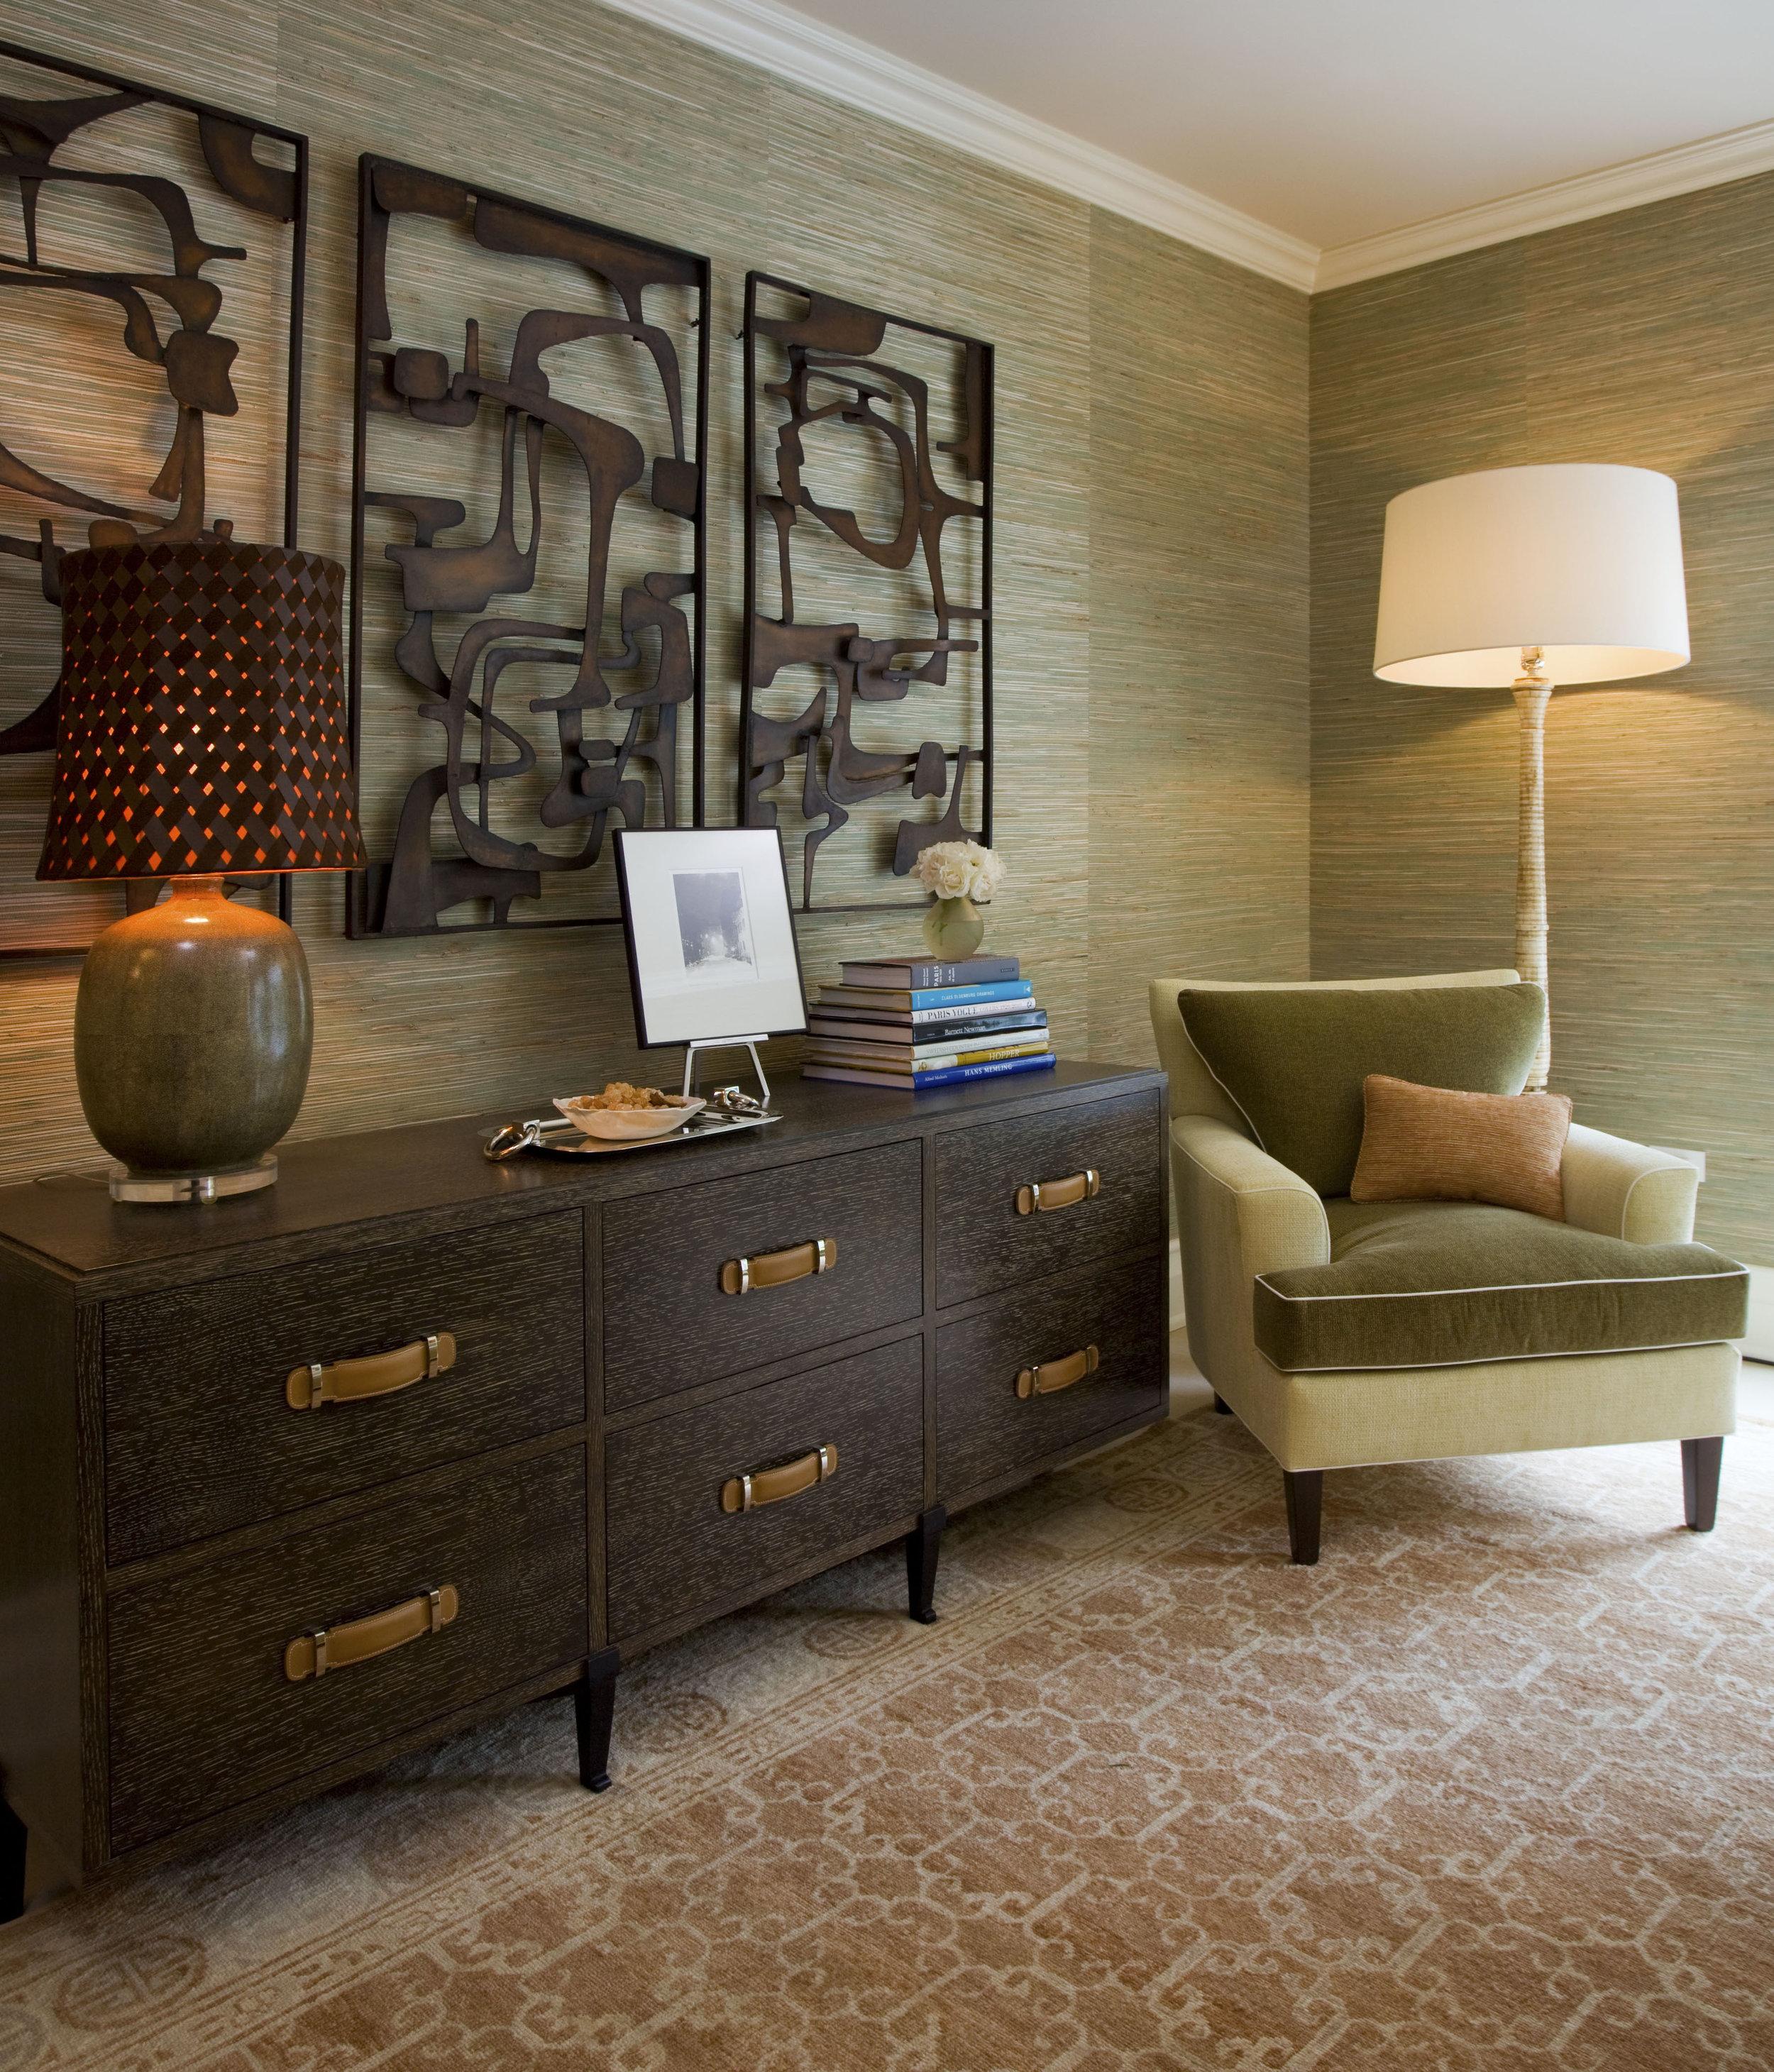 18 - CPW-22 Bedroom 3.jpg